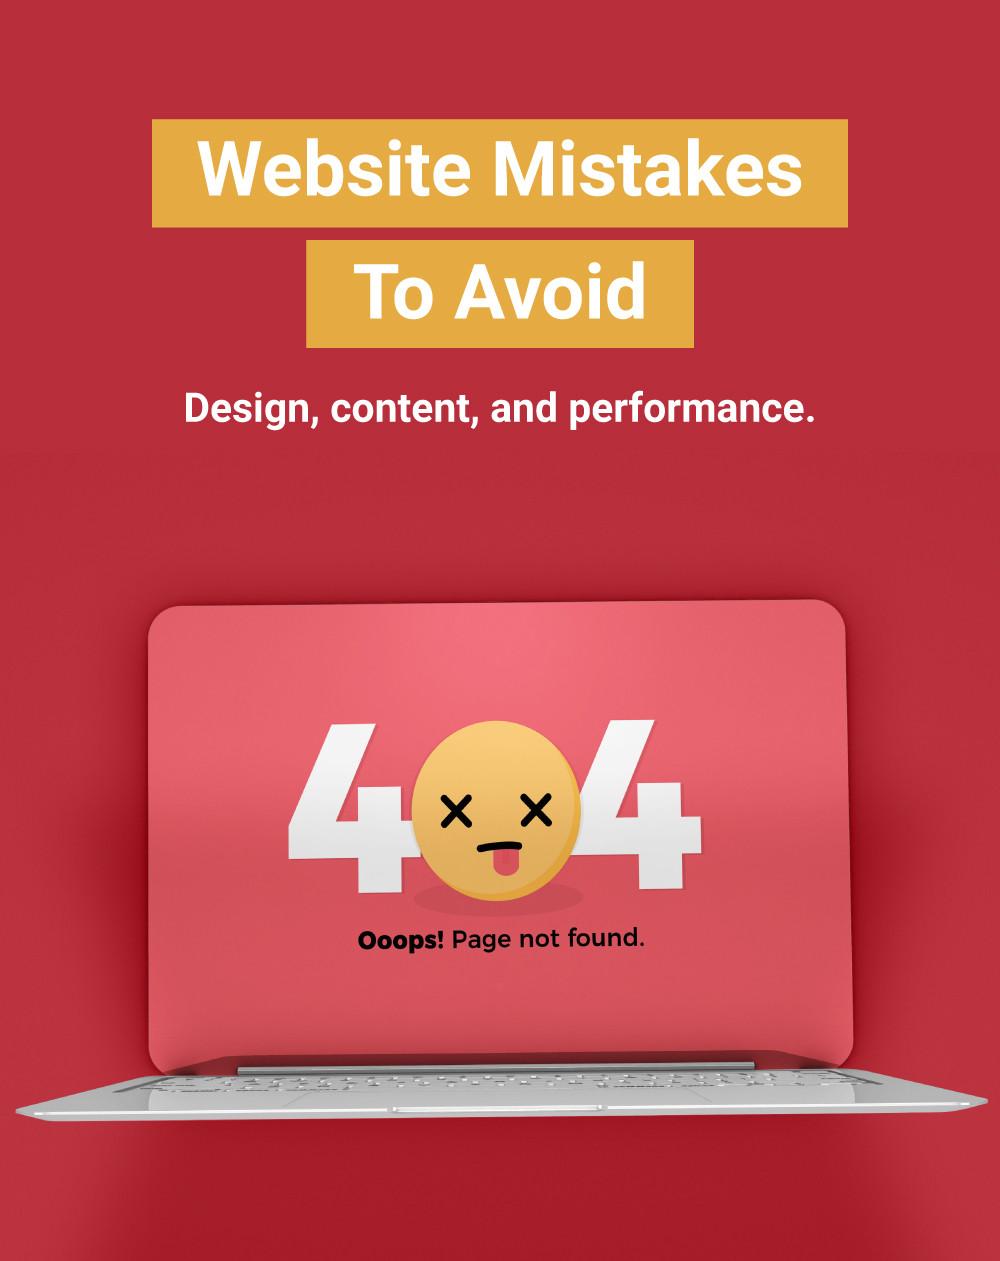 18 Website Mistakes To Avoid